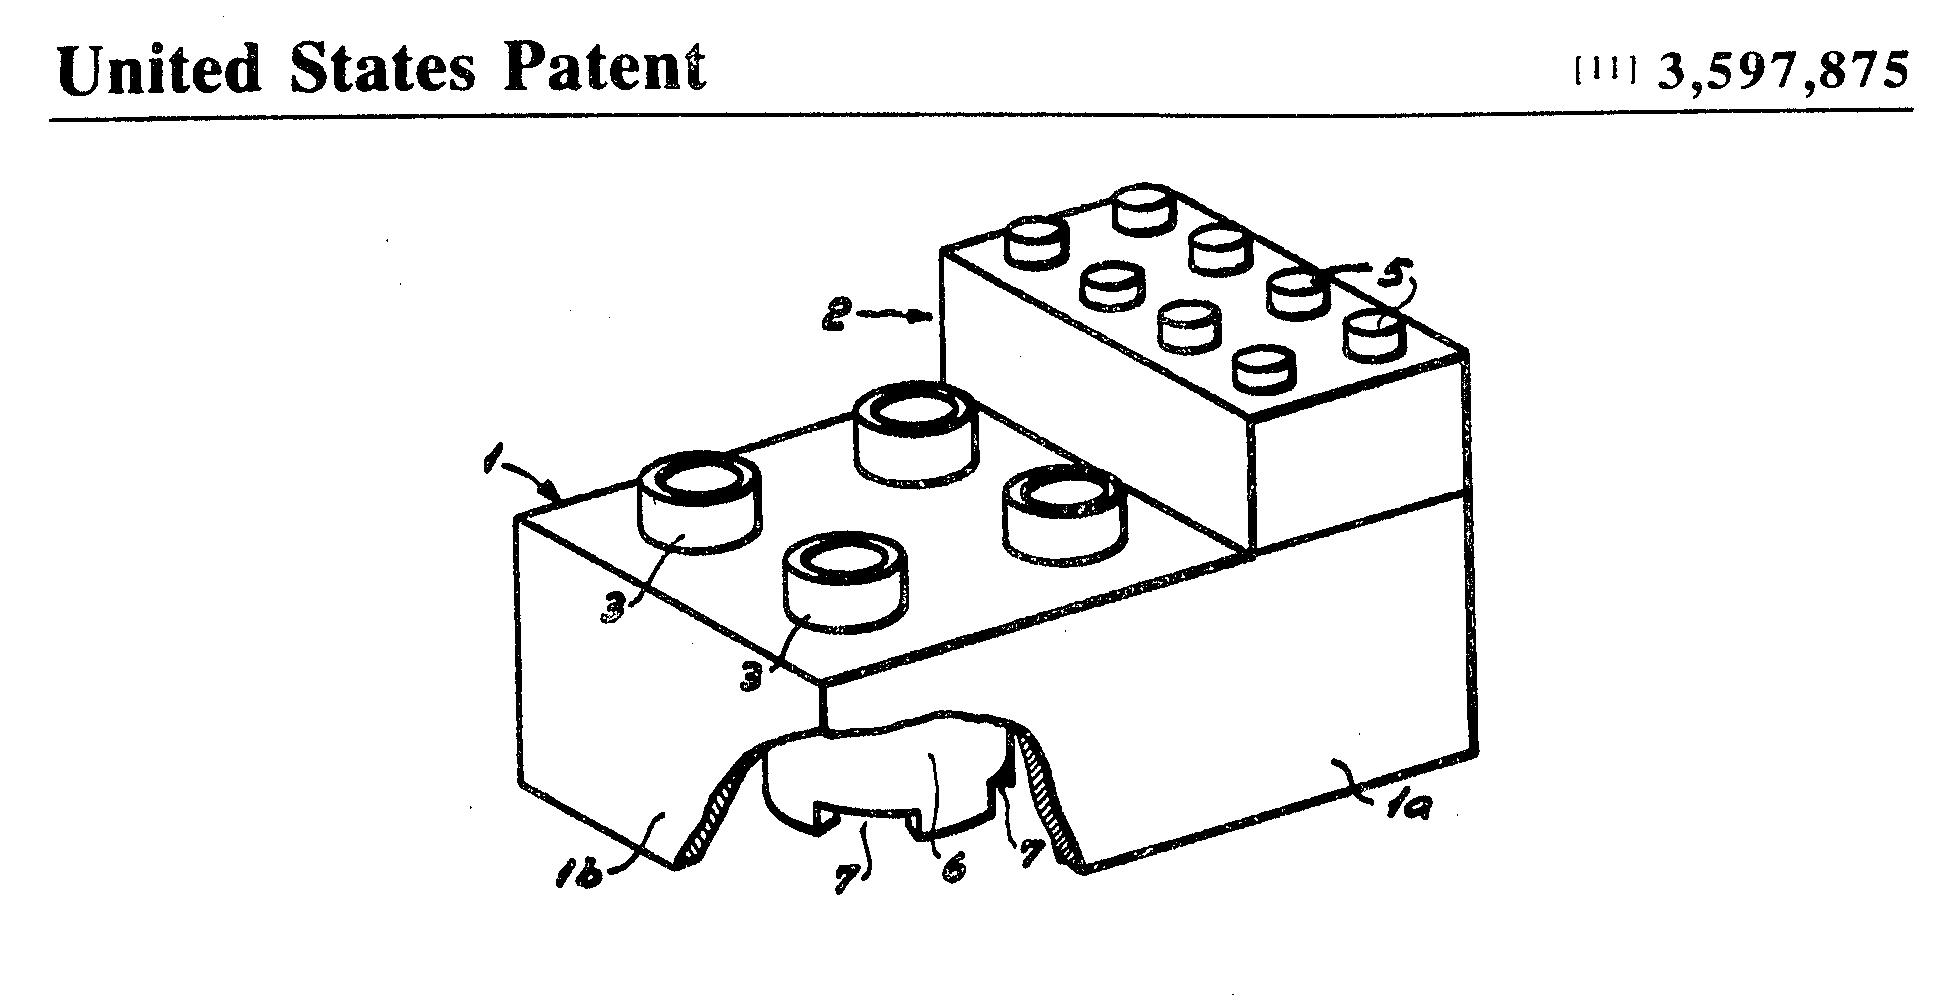 Leo patent image